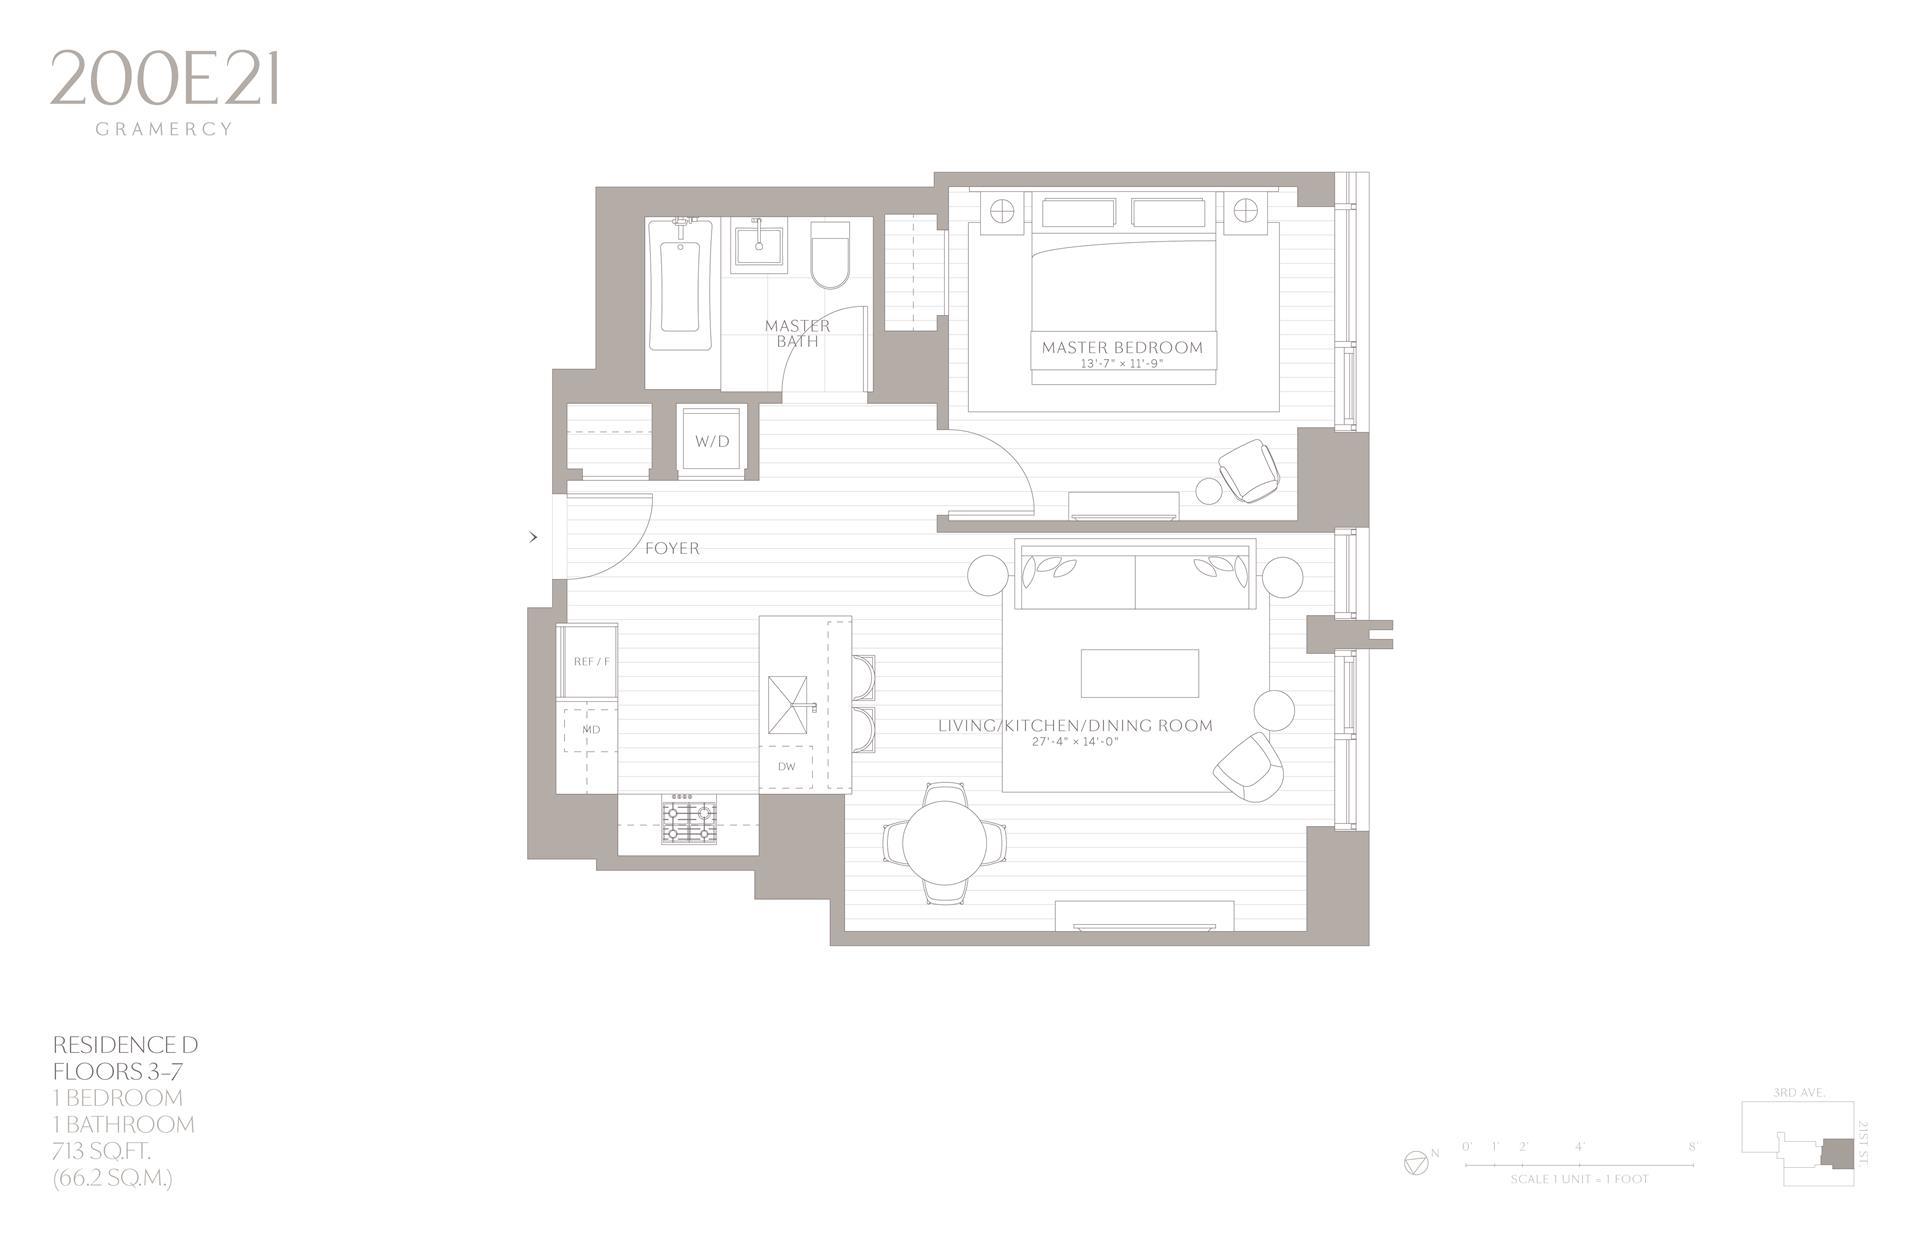 Floor plan of 200 East 21st Street, 3D - Gramercy - Union Square, New York